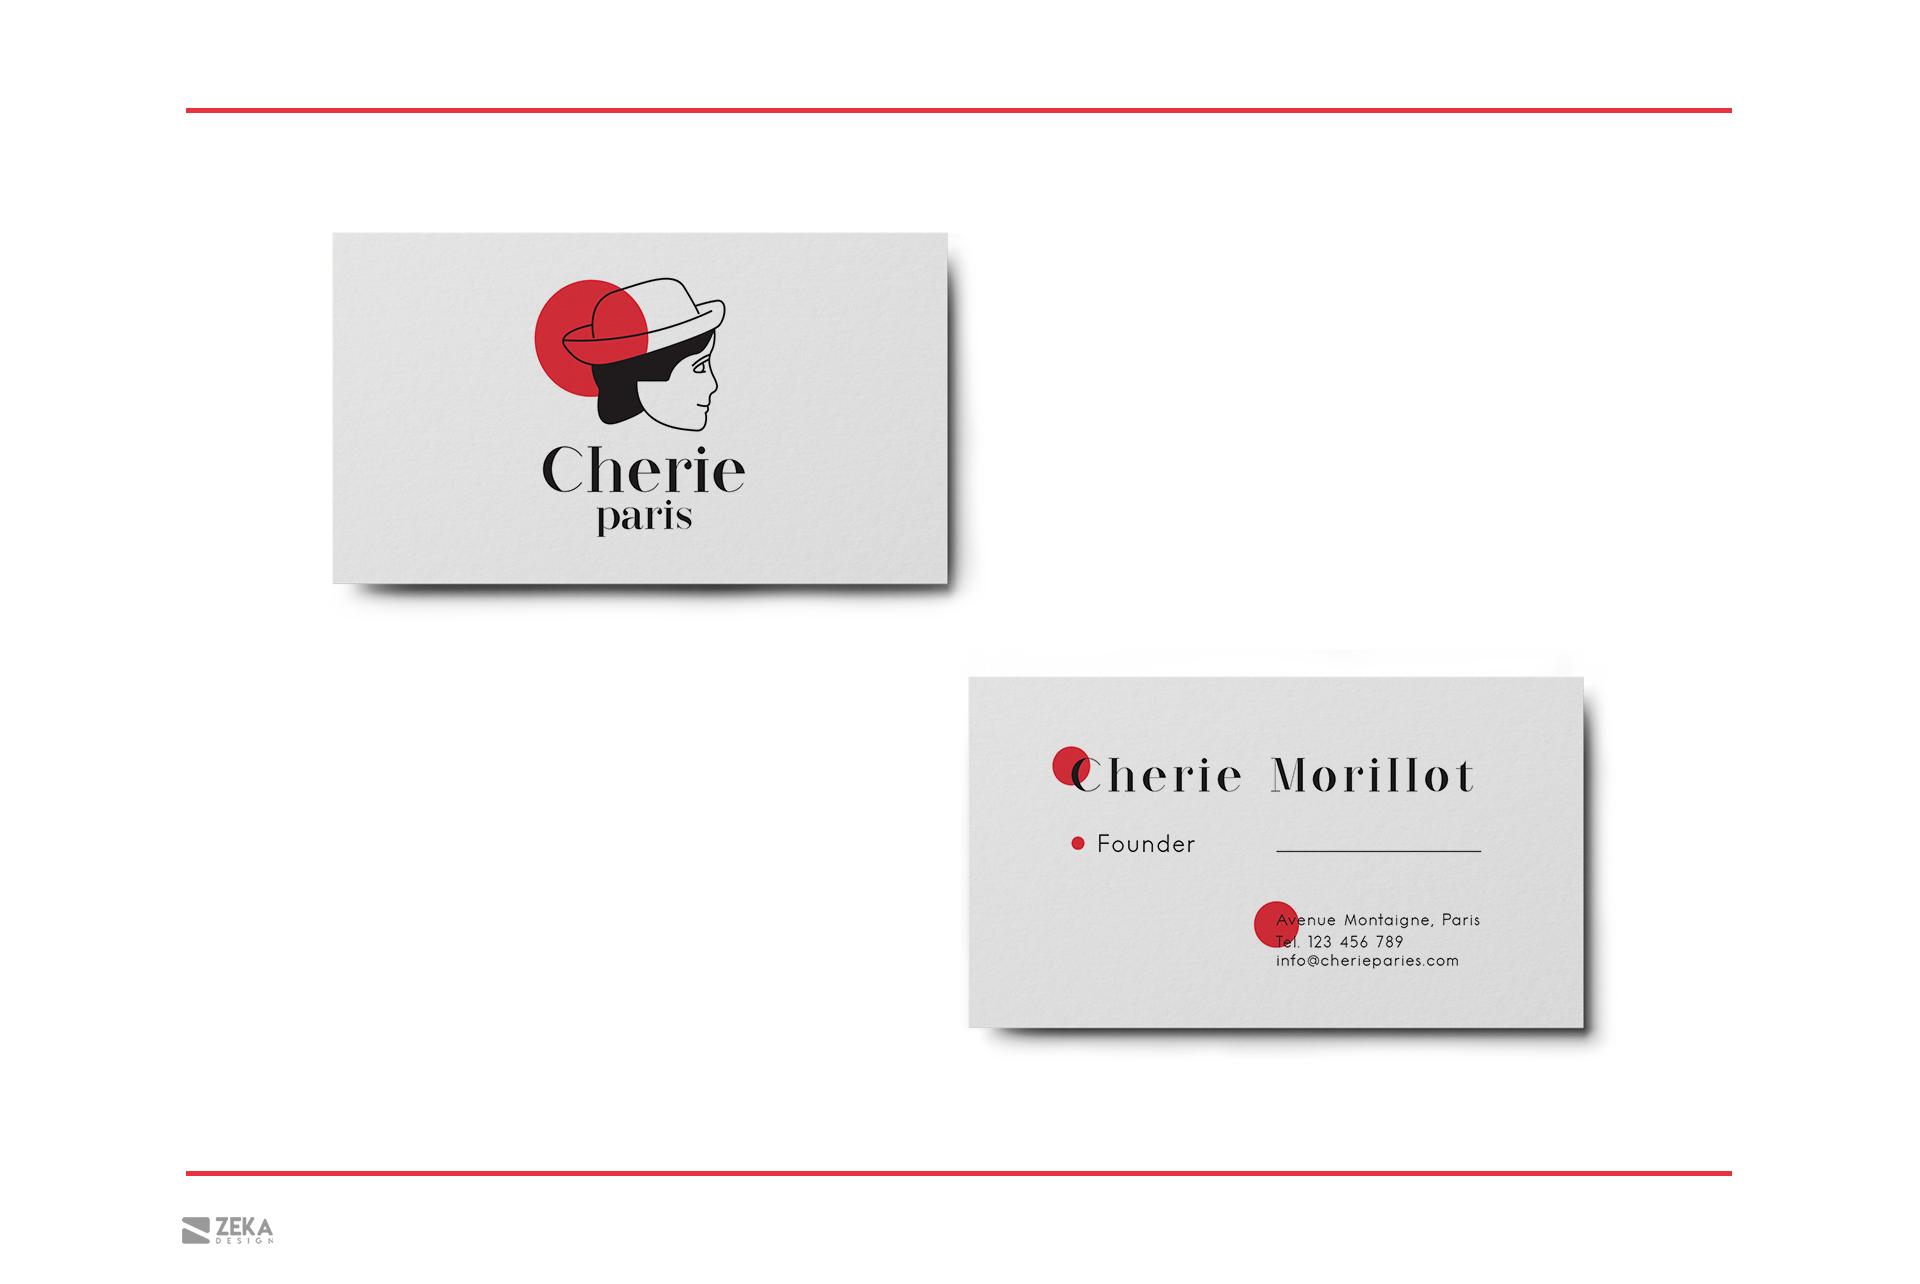 Cherie Paris Logo Design and Brand Identity Concept